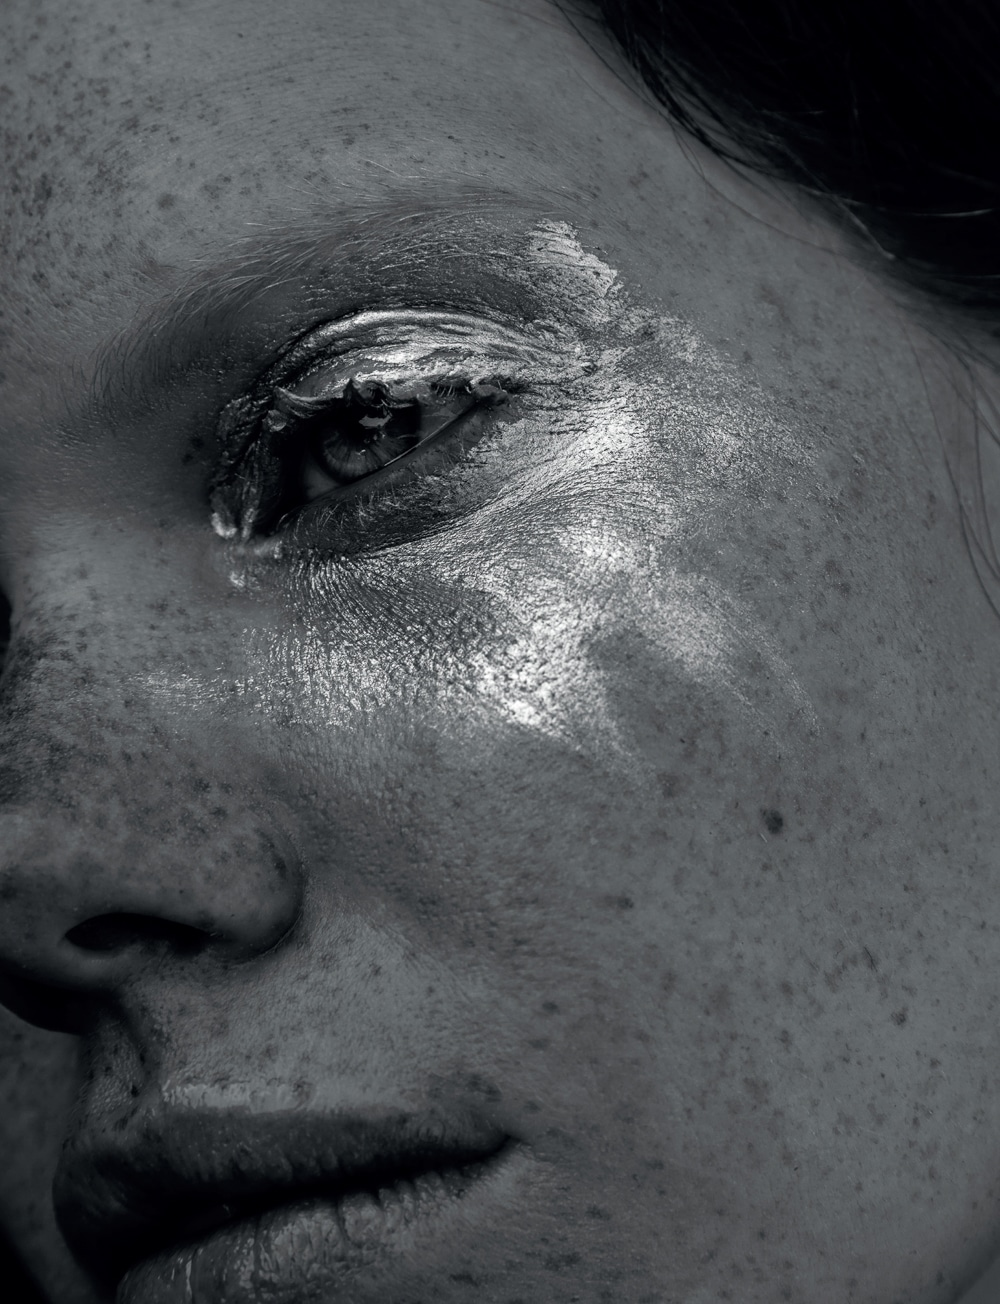 Vogue-Portugal-Nika-Rusakova-Filip-Koludrovic-13.jpg